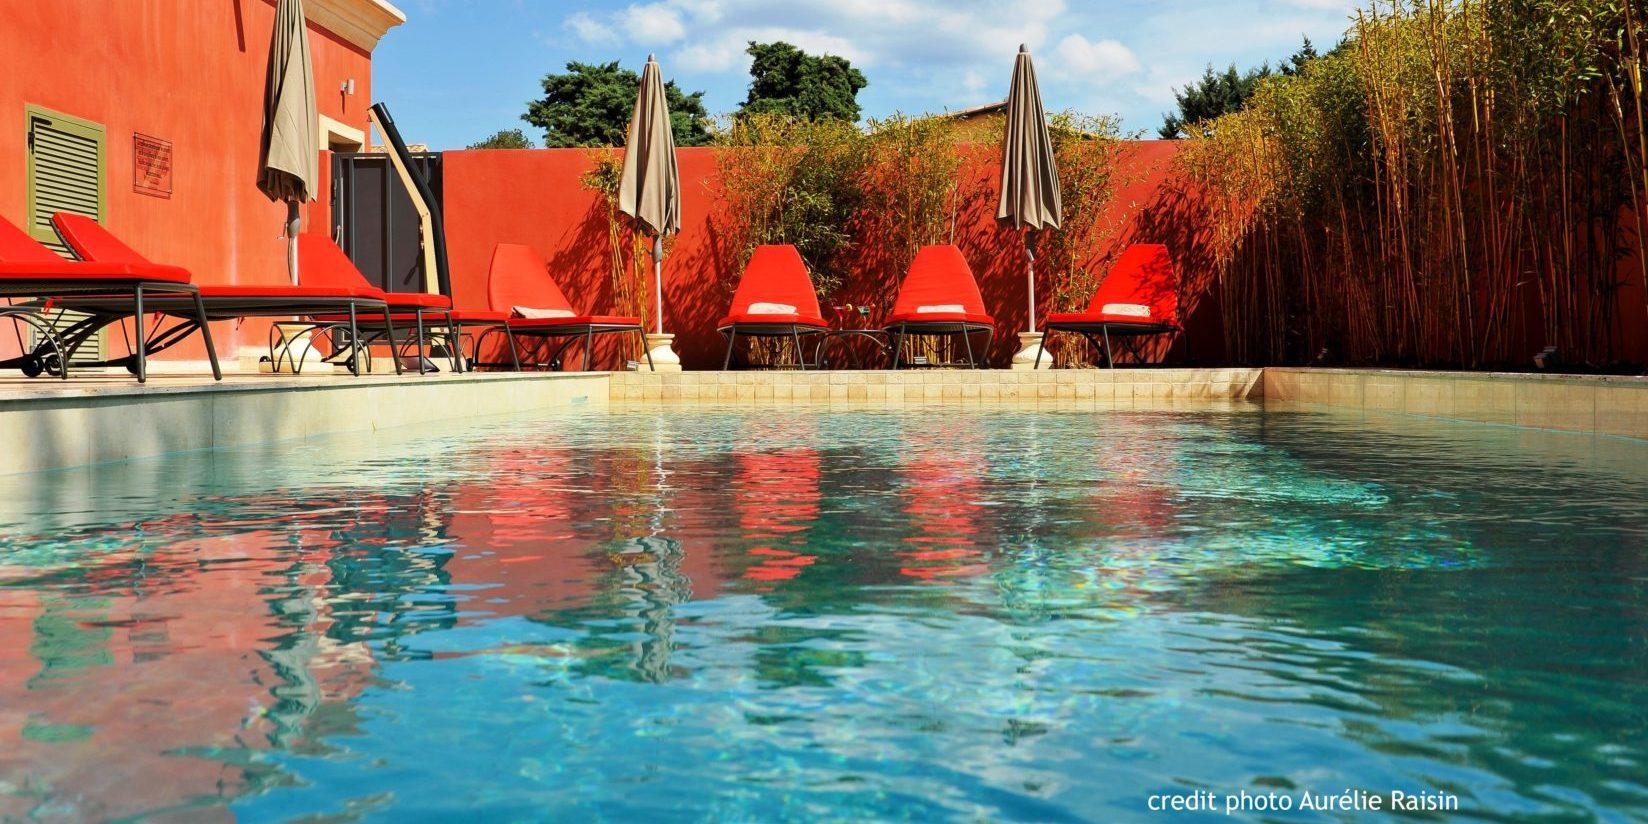 Boutique Hotel Liberata Ile Rousse Balagne Corsica Frankrijk zwembad ligbedden parasols detail